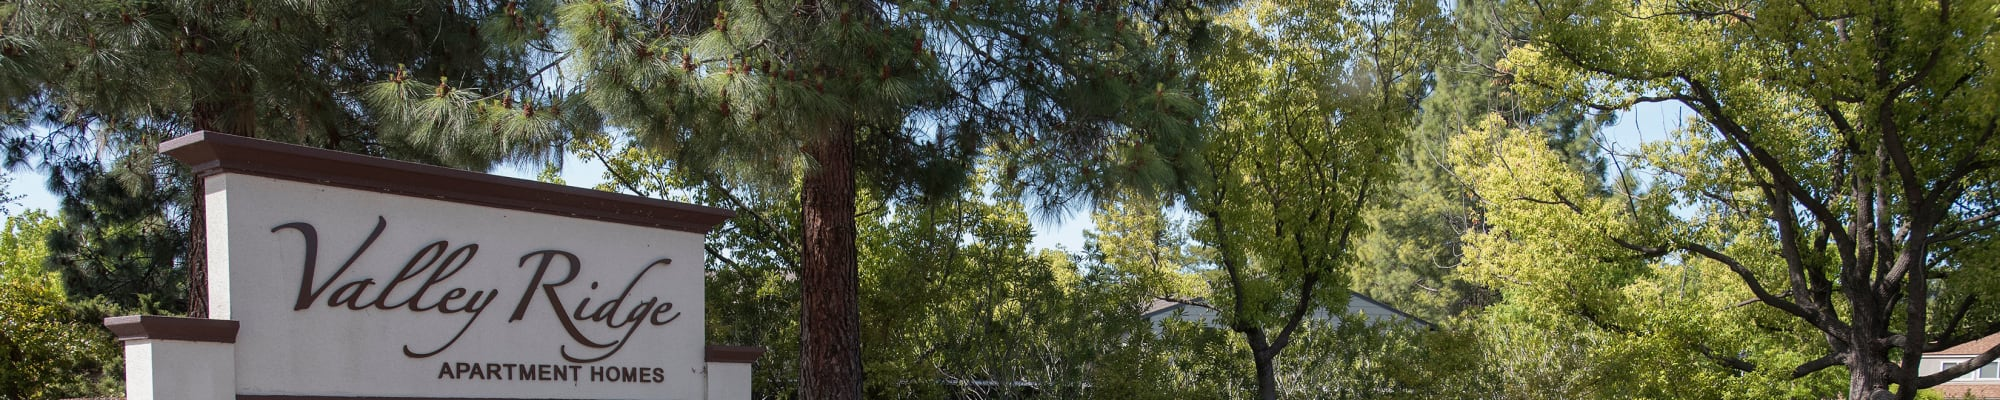 Resident perks at Valley Ridge Apartment Homes in Martinez, California